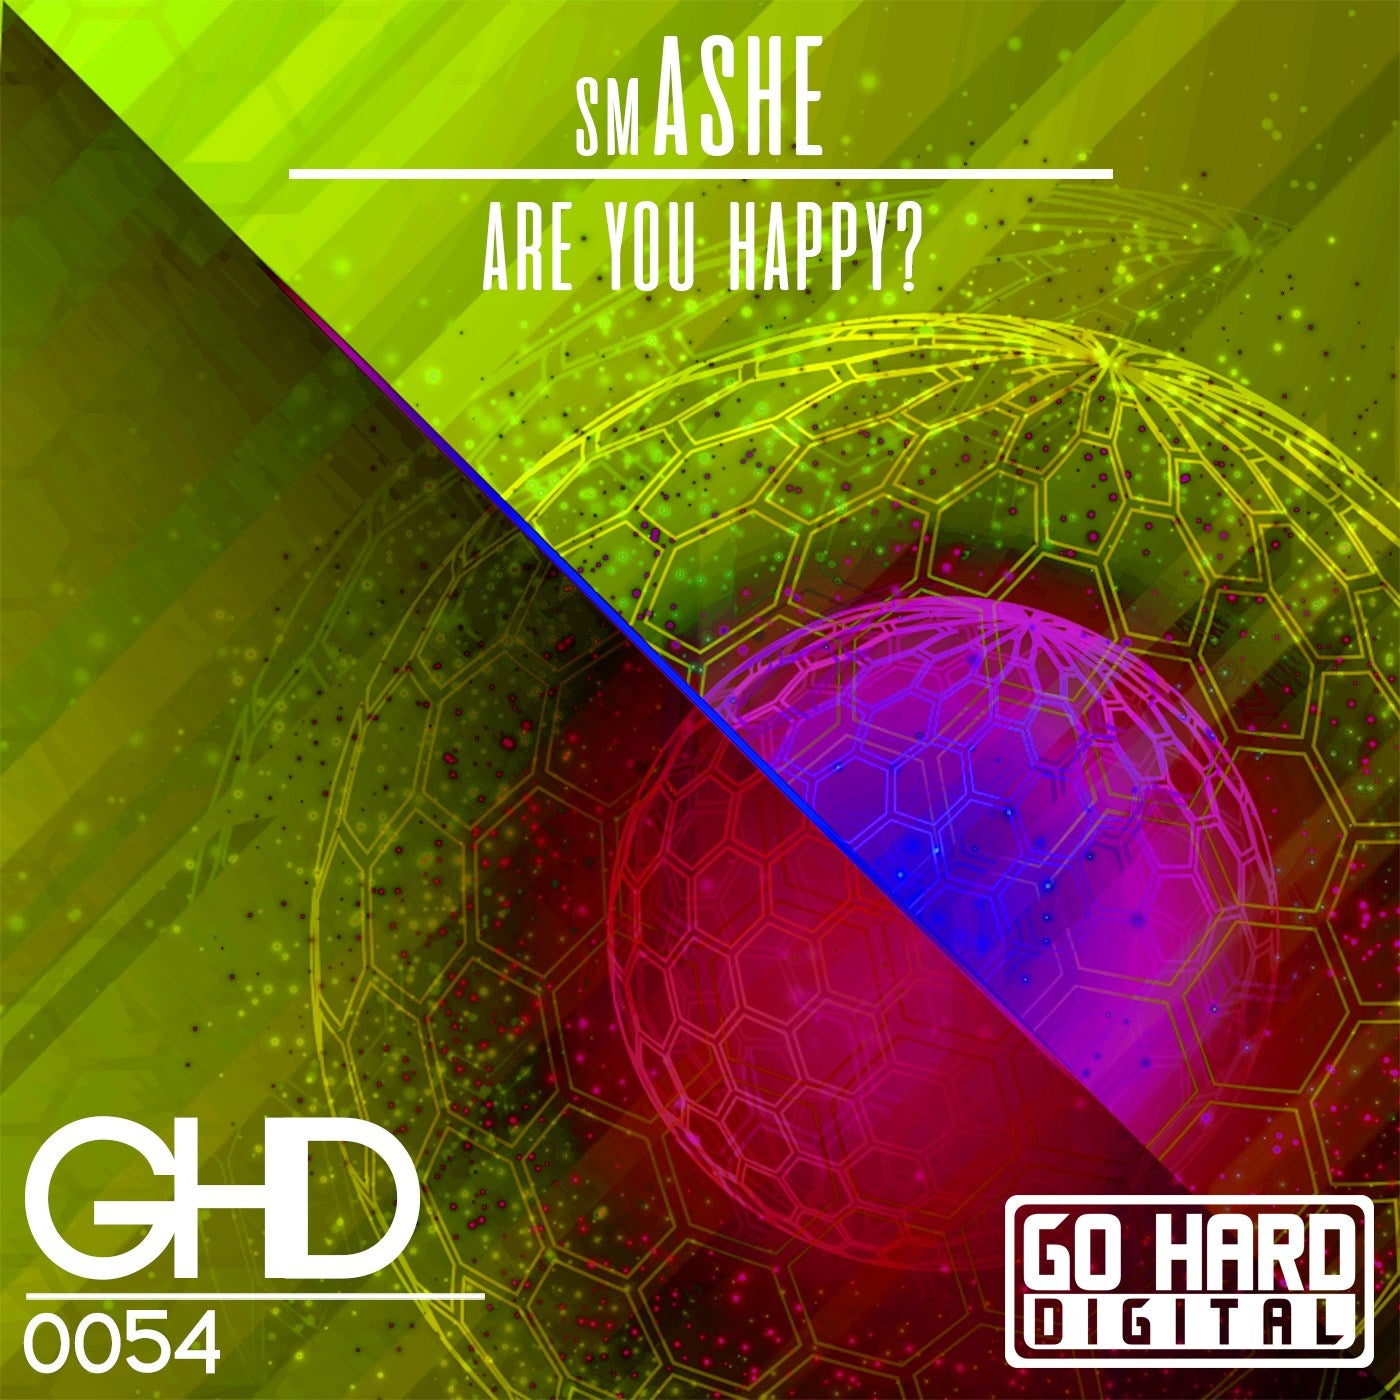 Are You Happy? (Original Mix)